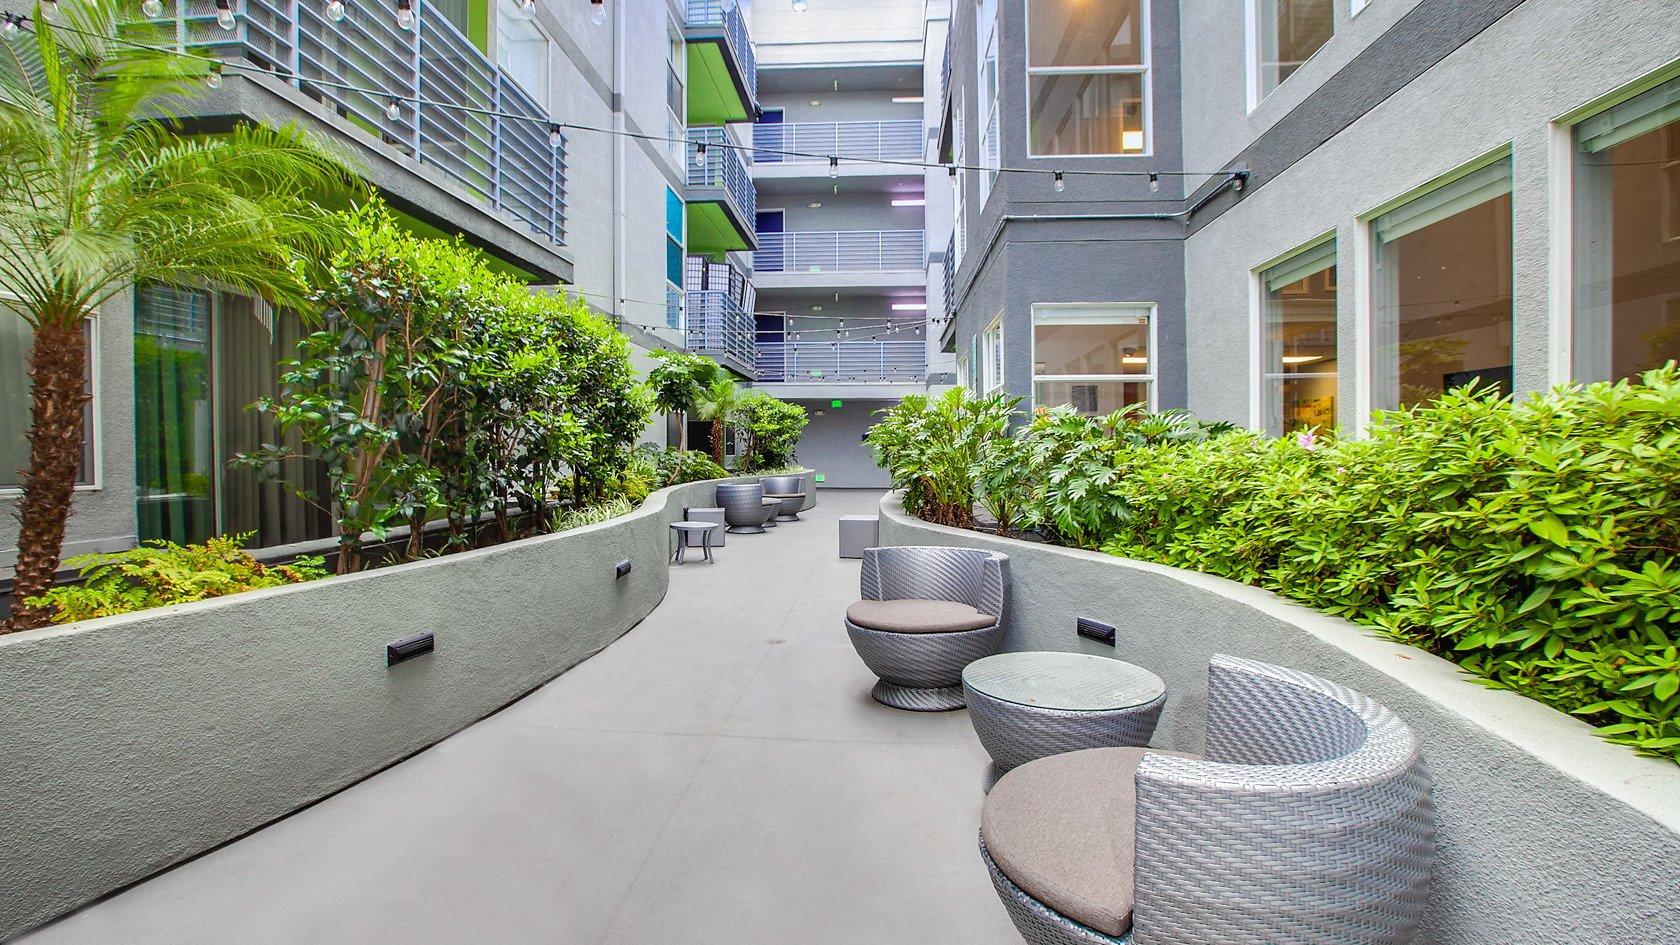 Park Catalina Serviced Rental-Sample Image of Los Angeles CA Intern Home